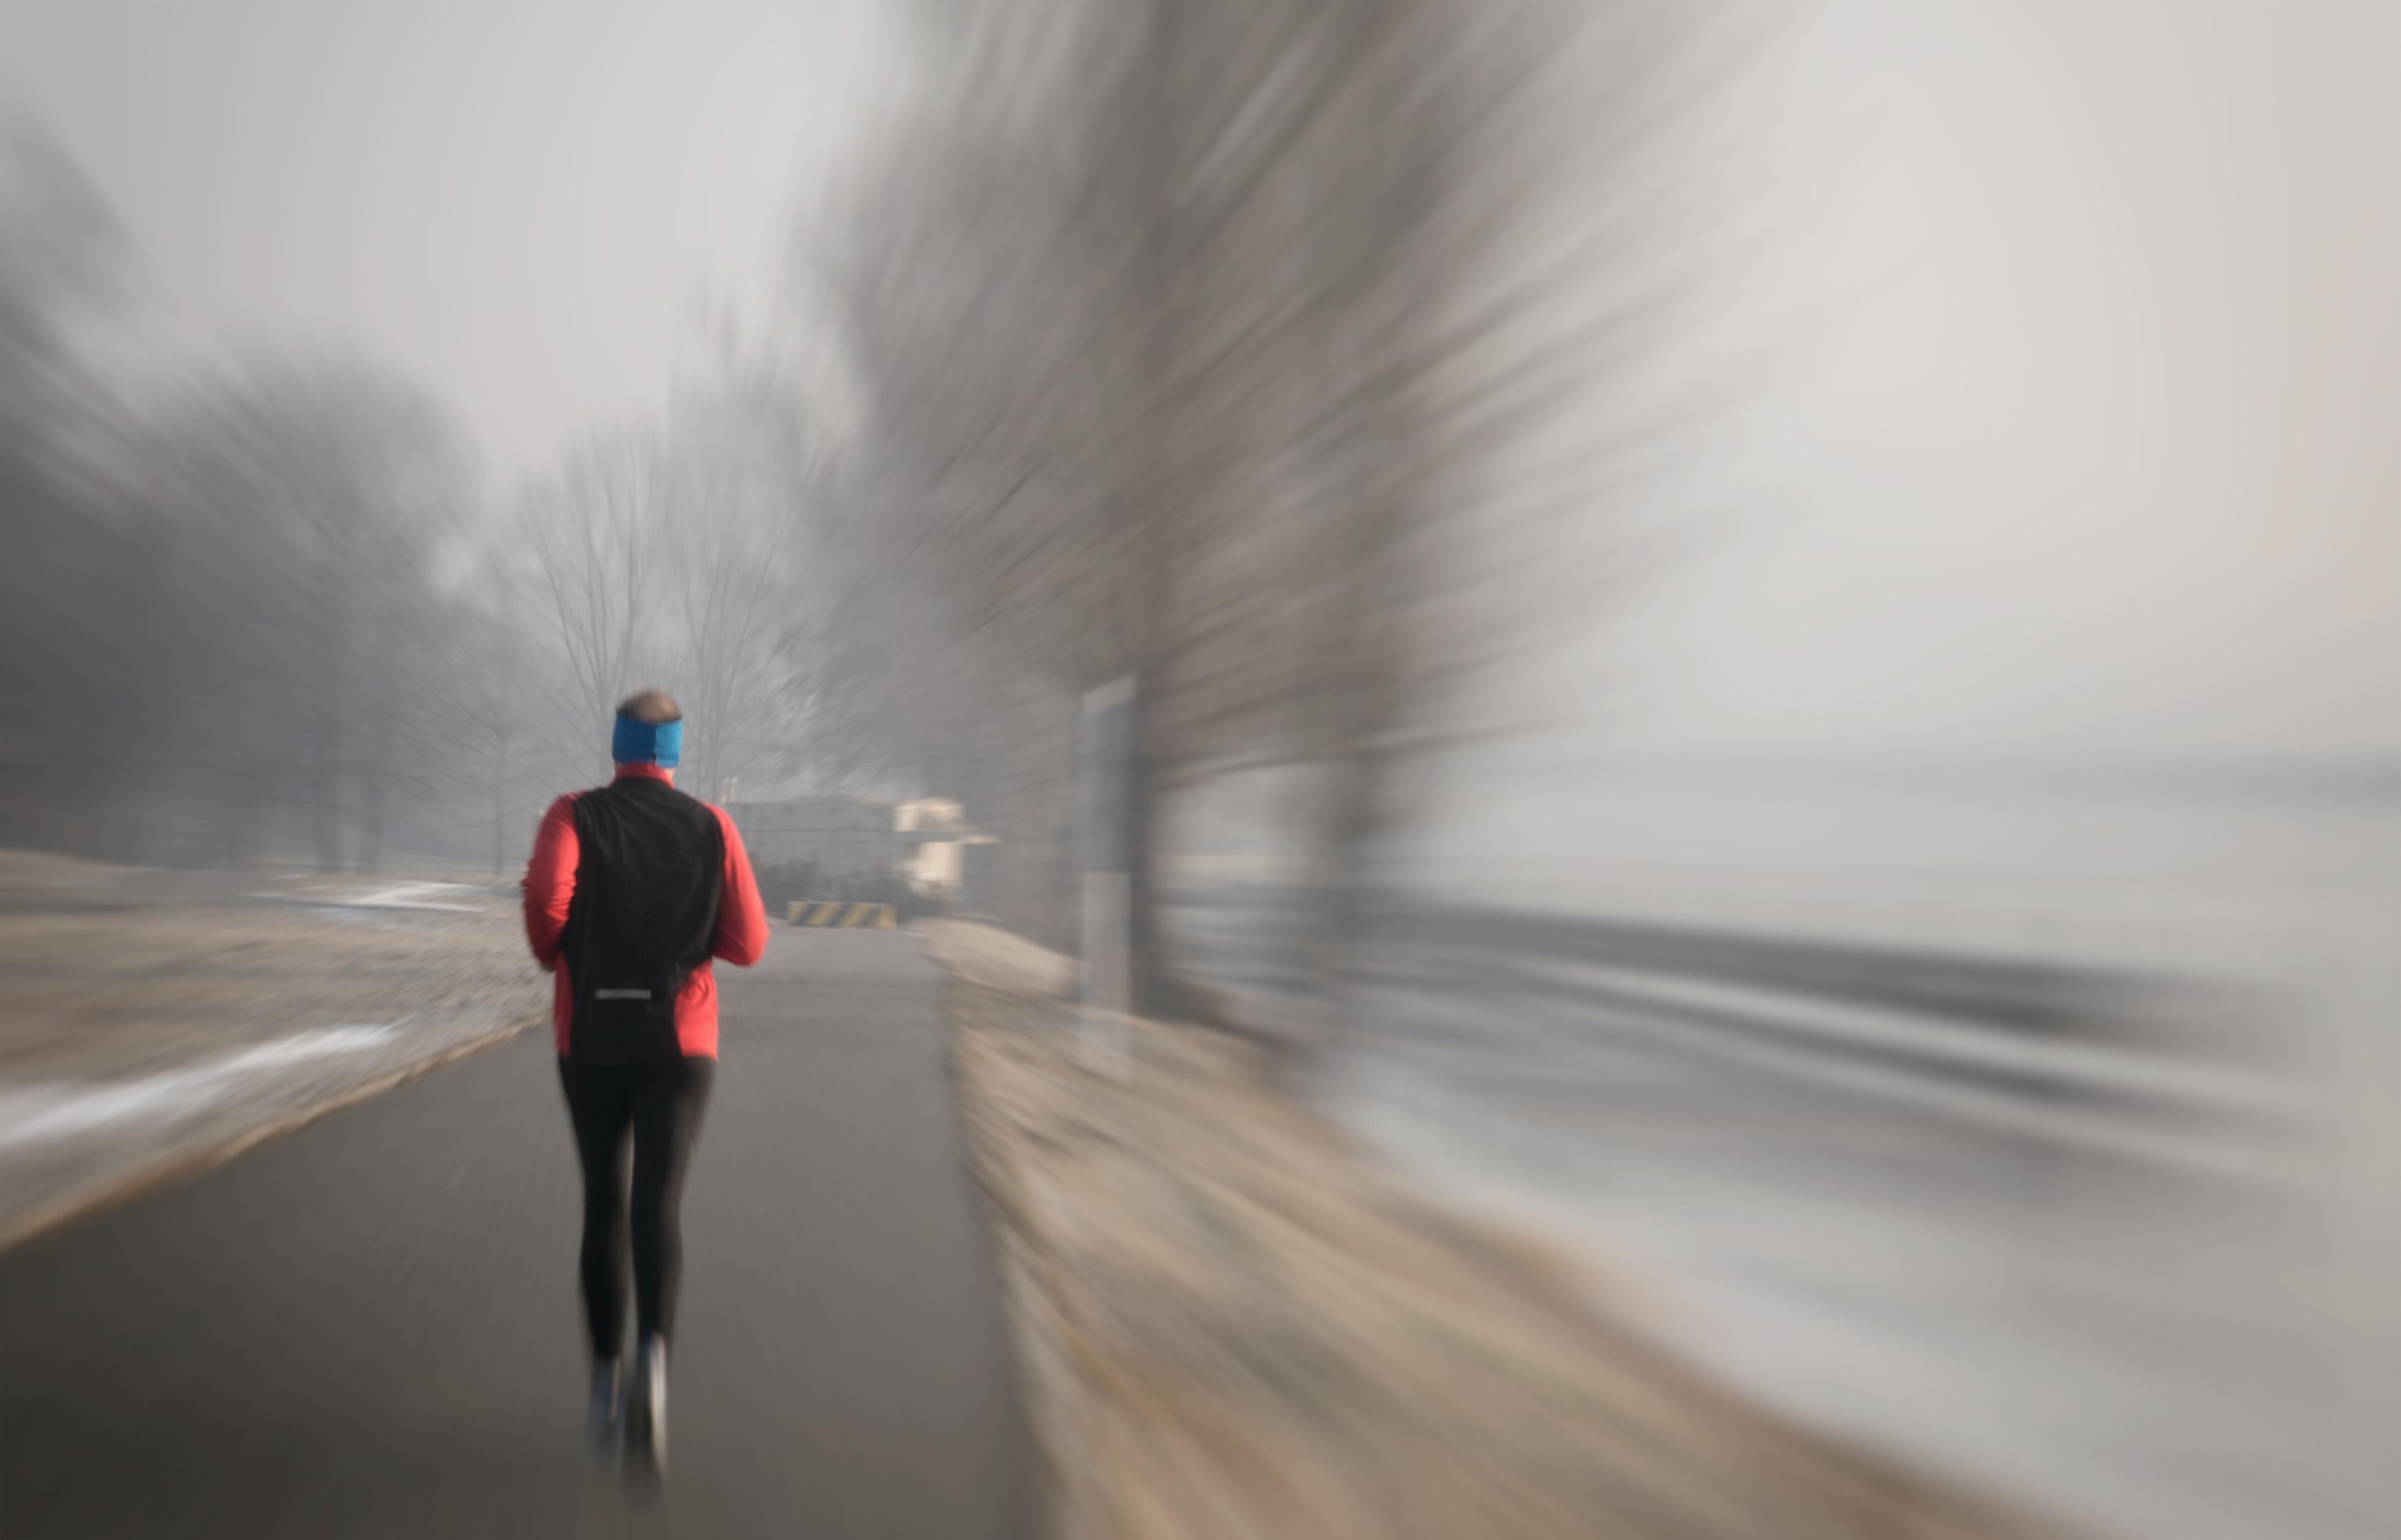 FREE IMAGE: Morning Runner - Libreshot Public Domain Photos